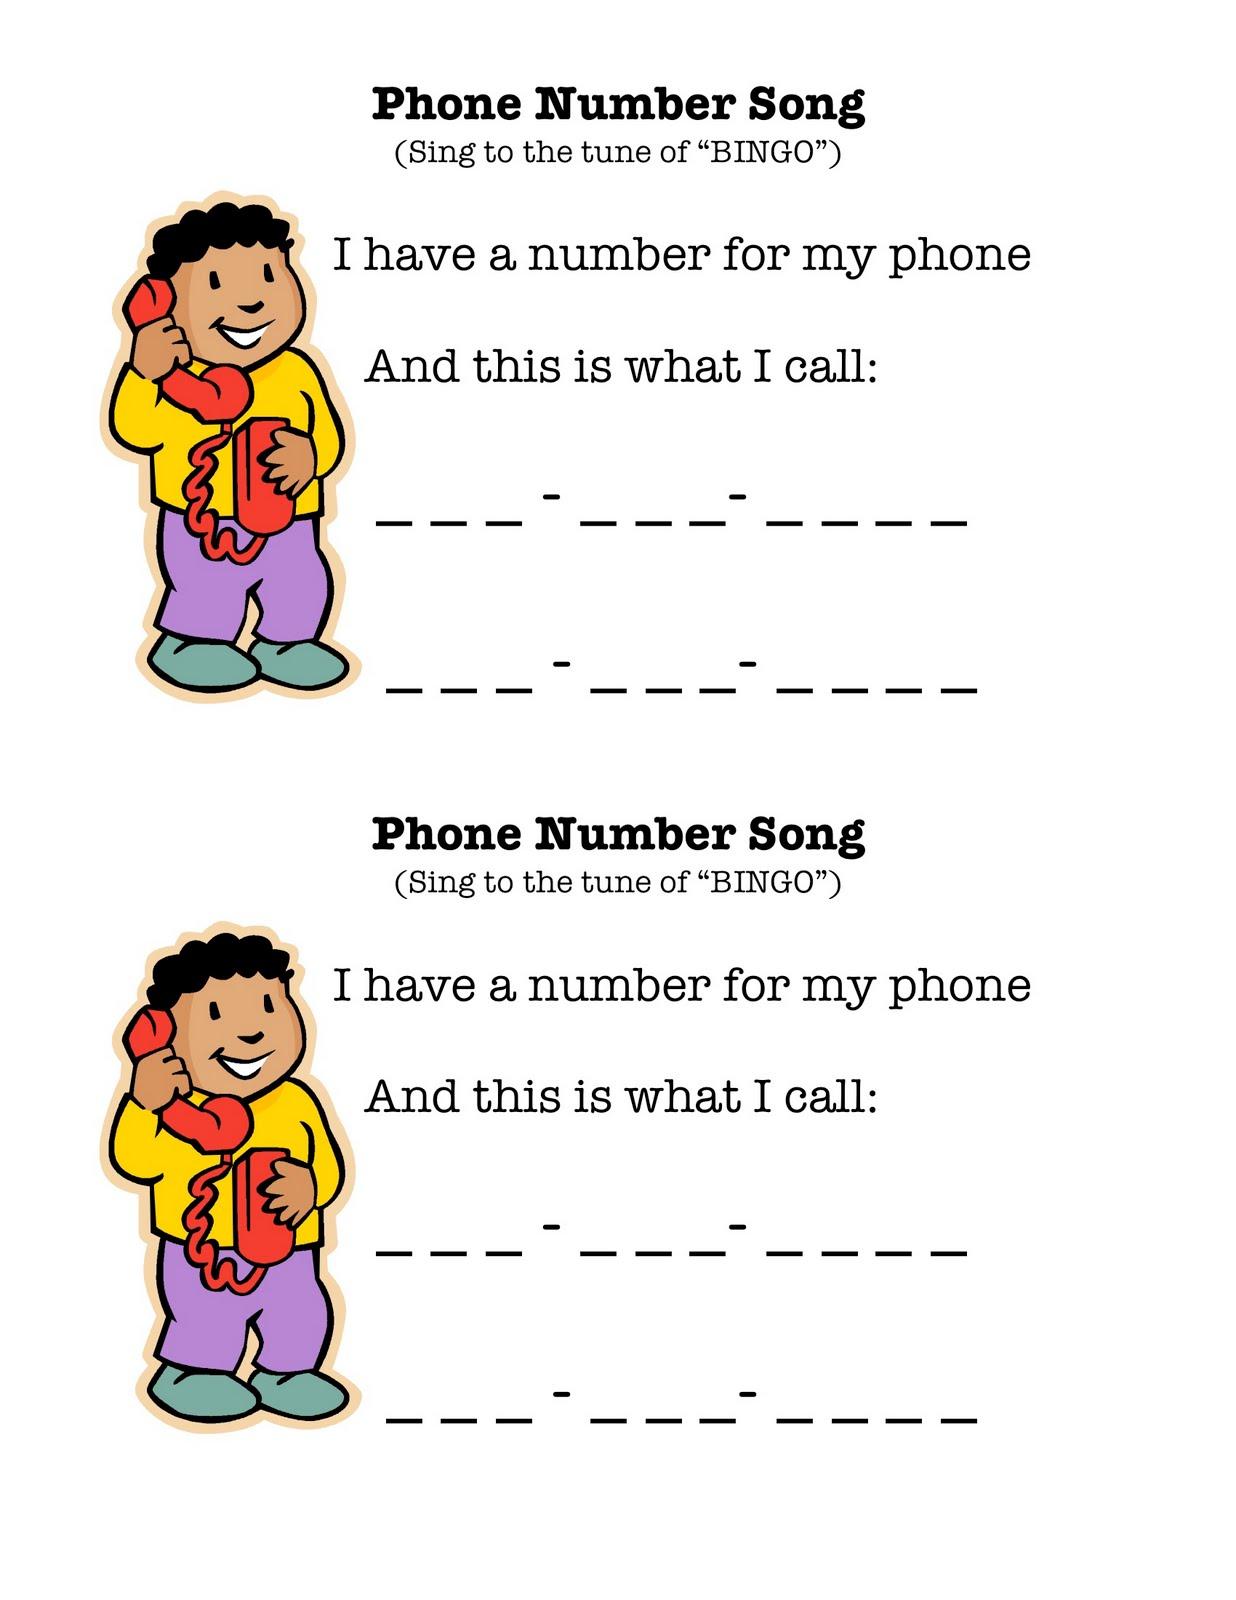 Imagination Express Preschool Phone Number Song